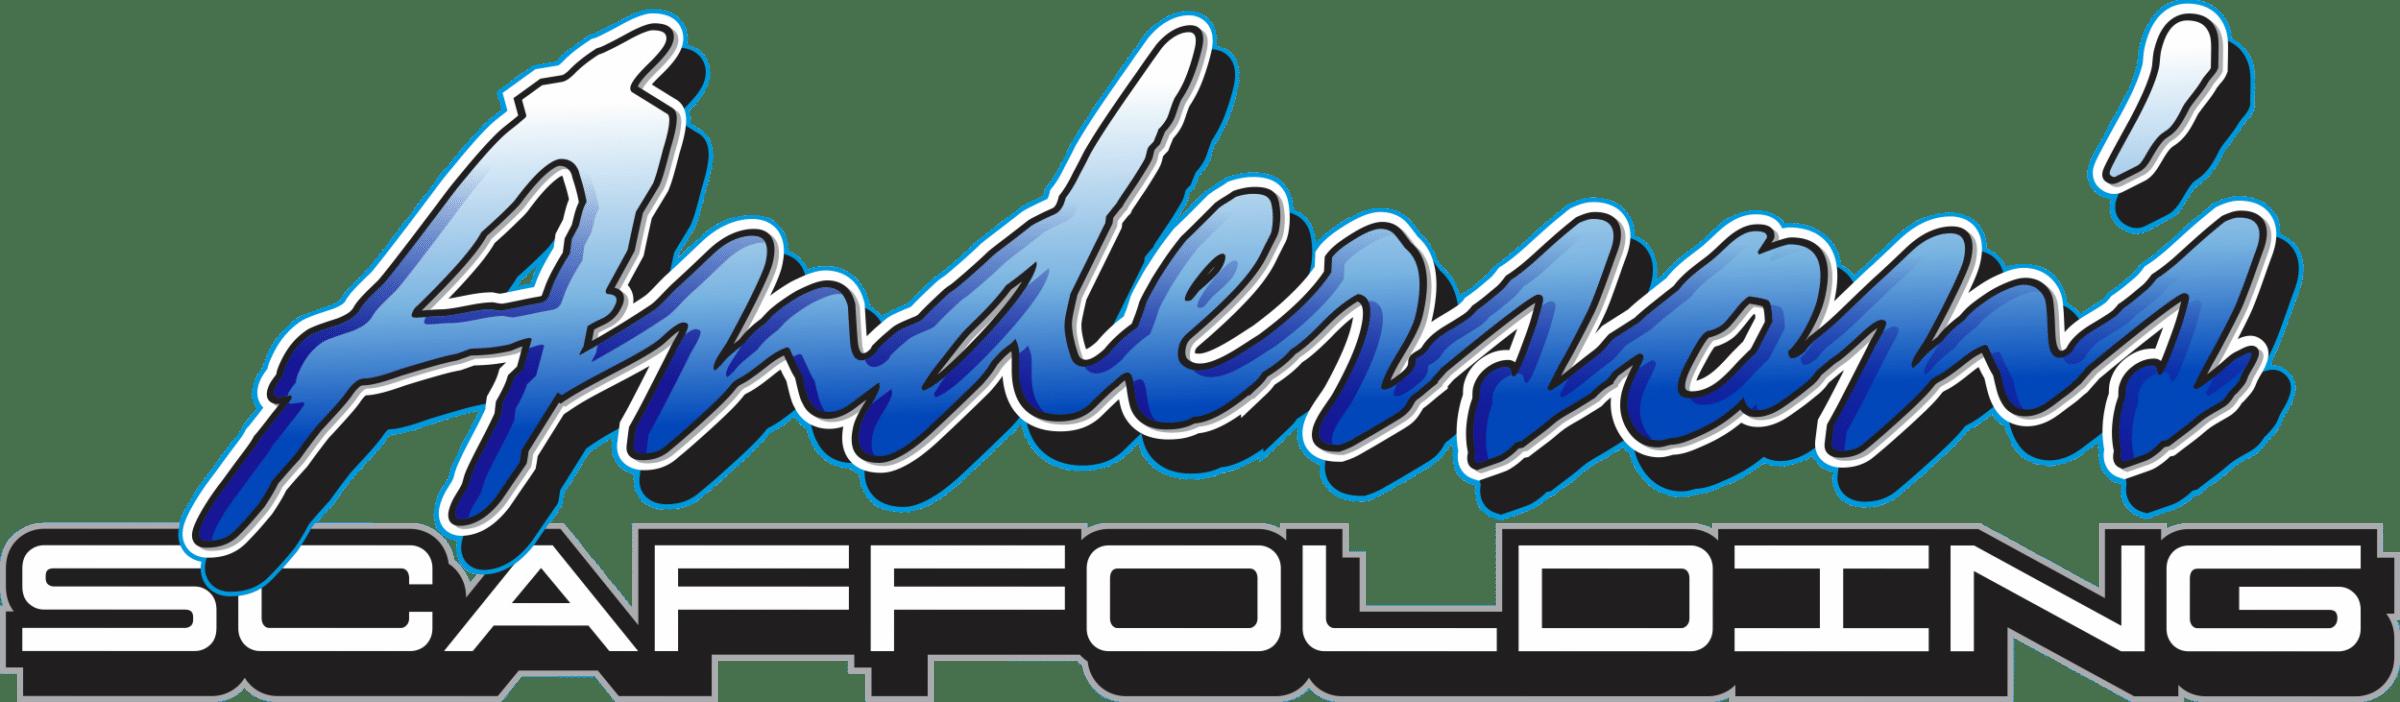 Anderson's Scaffolding_logo